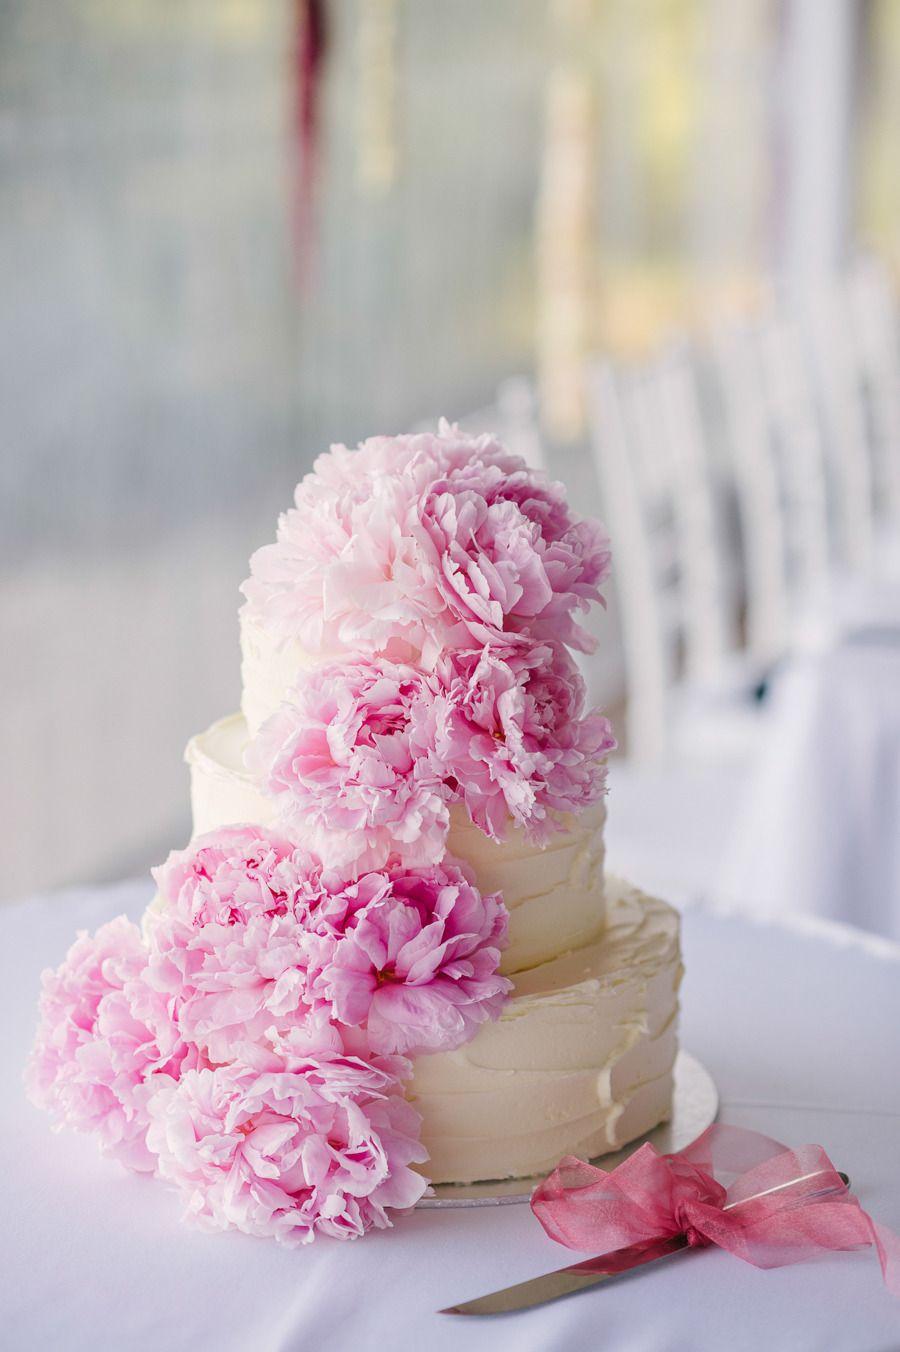 Whimisical Adelaide Hills Wedding | Peony, Wedding cake and Australia